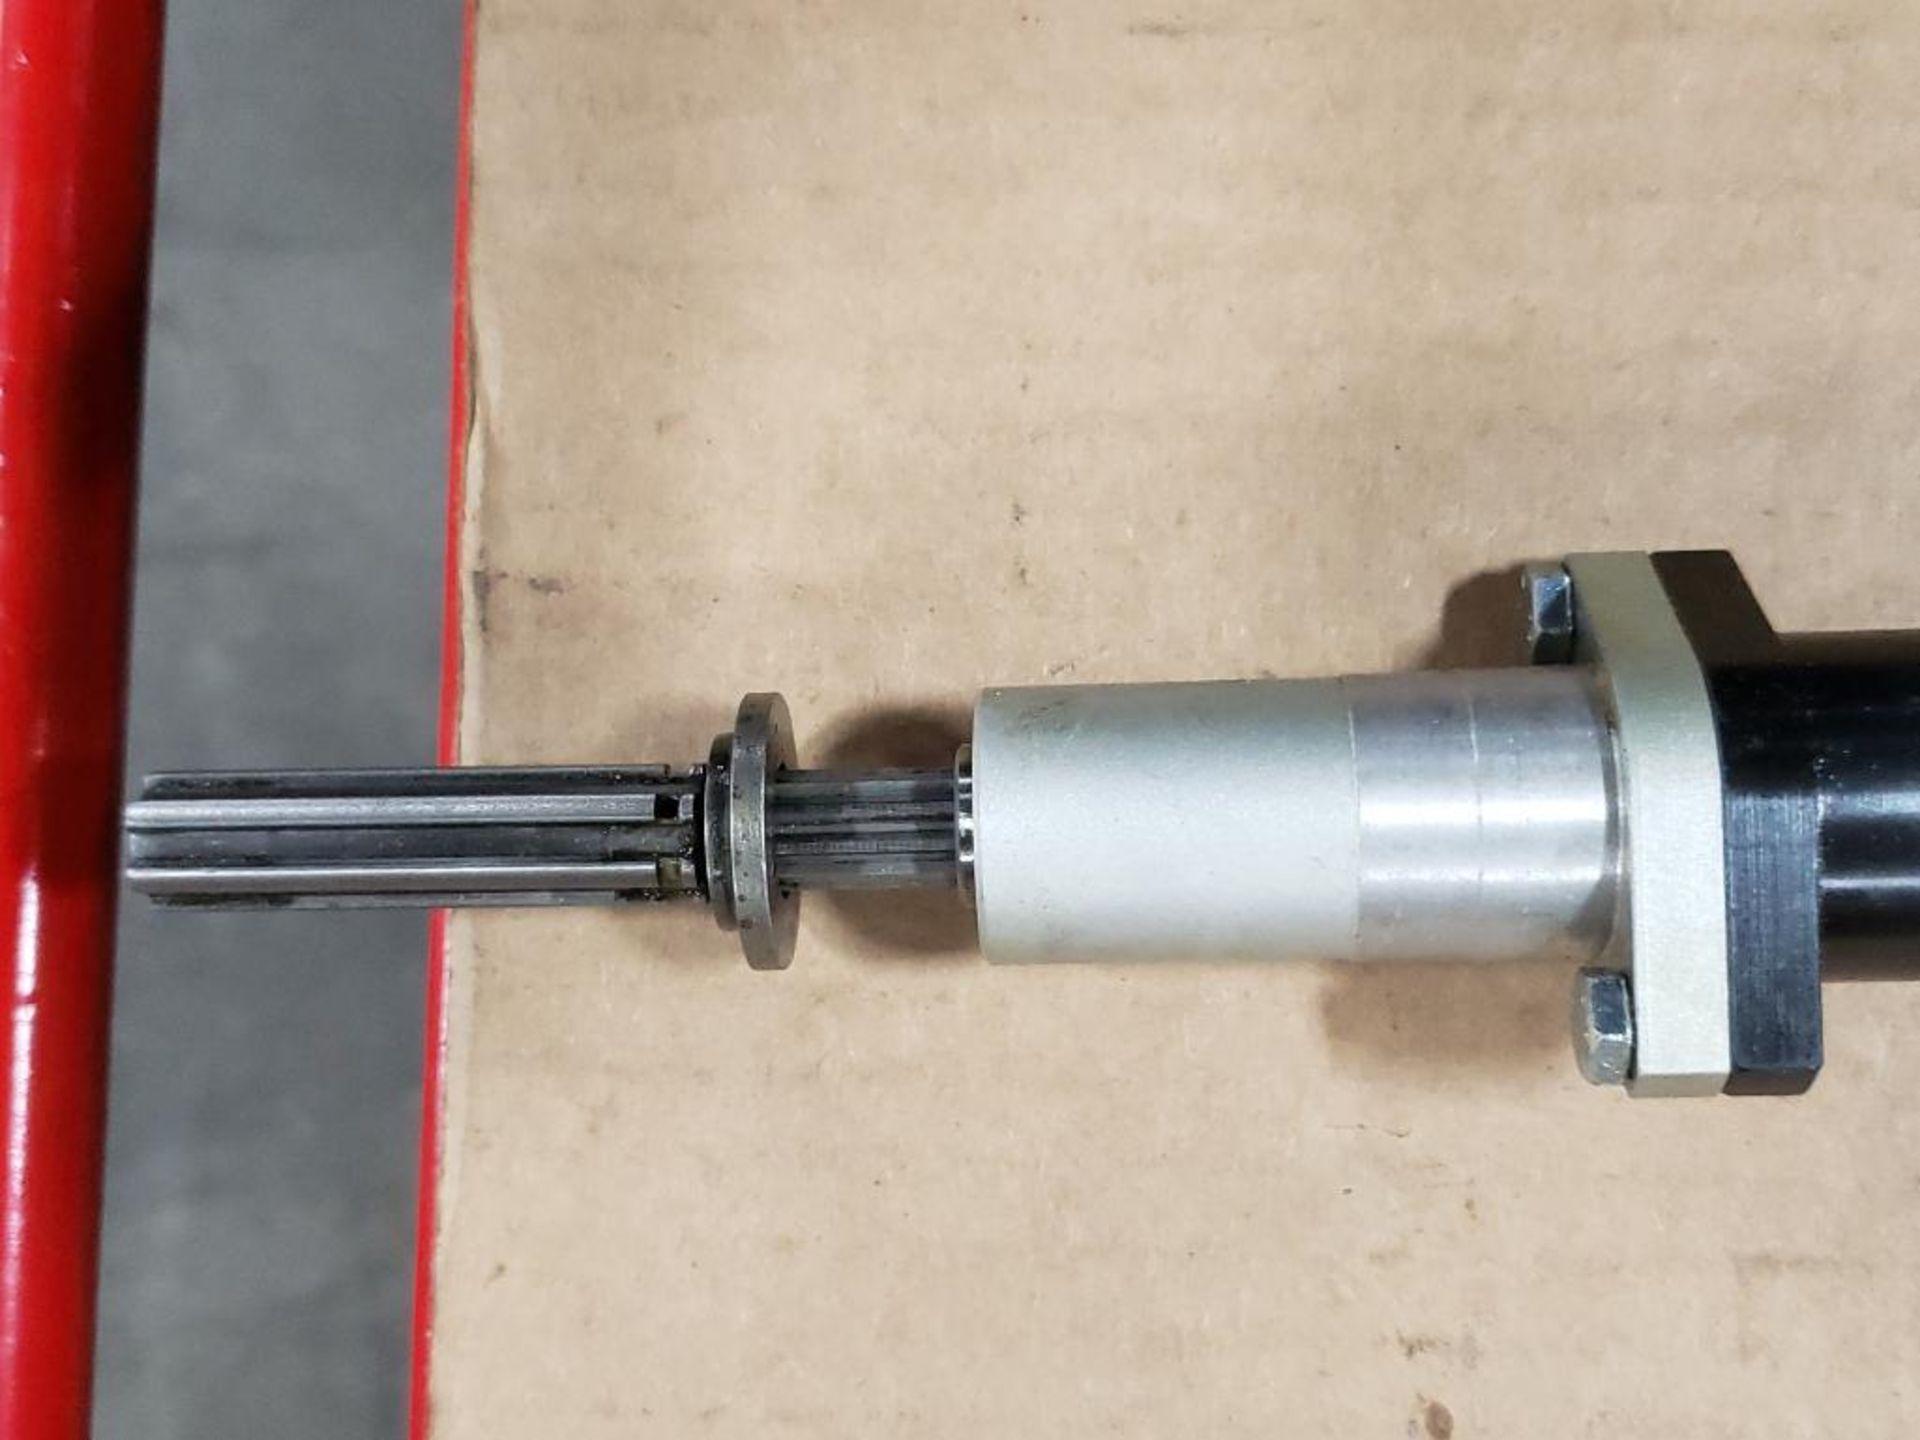 Bosch 0-608-PE0-310 Nutrunner. - Image 8 of 8